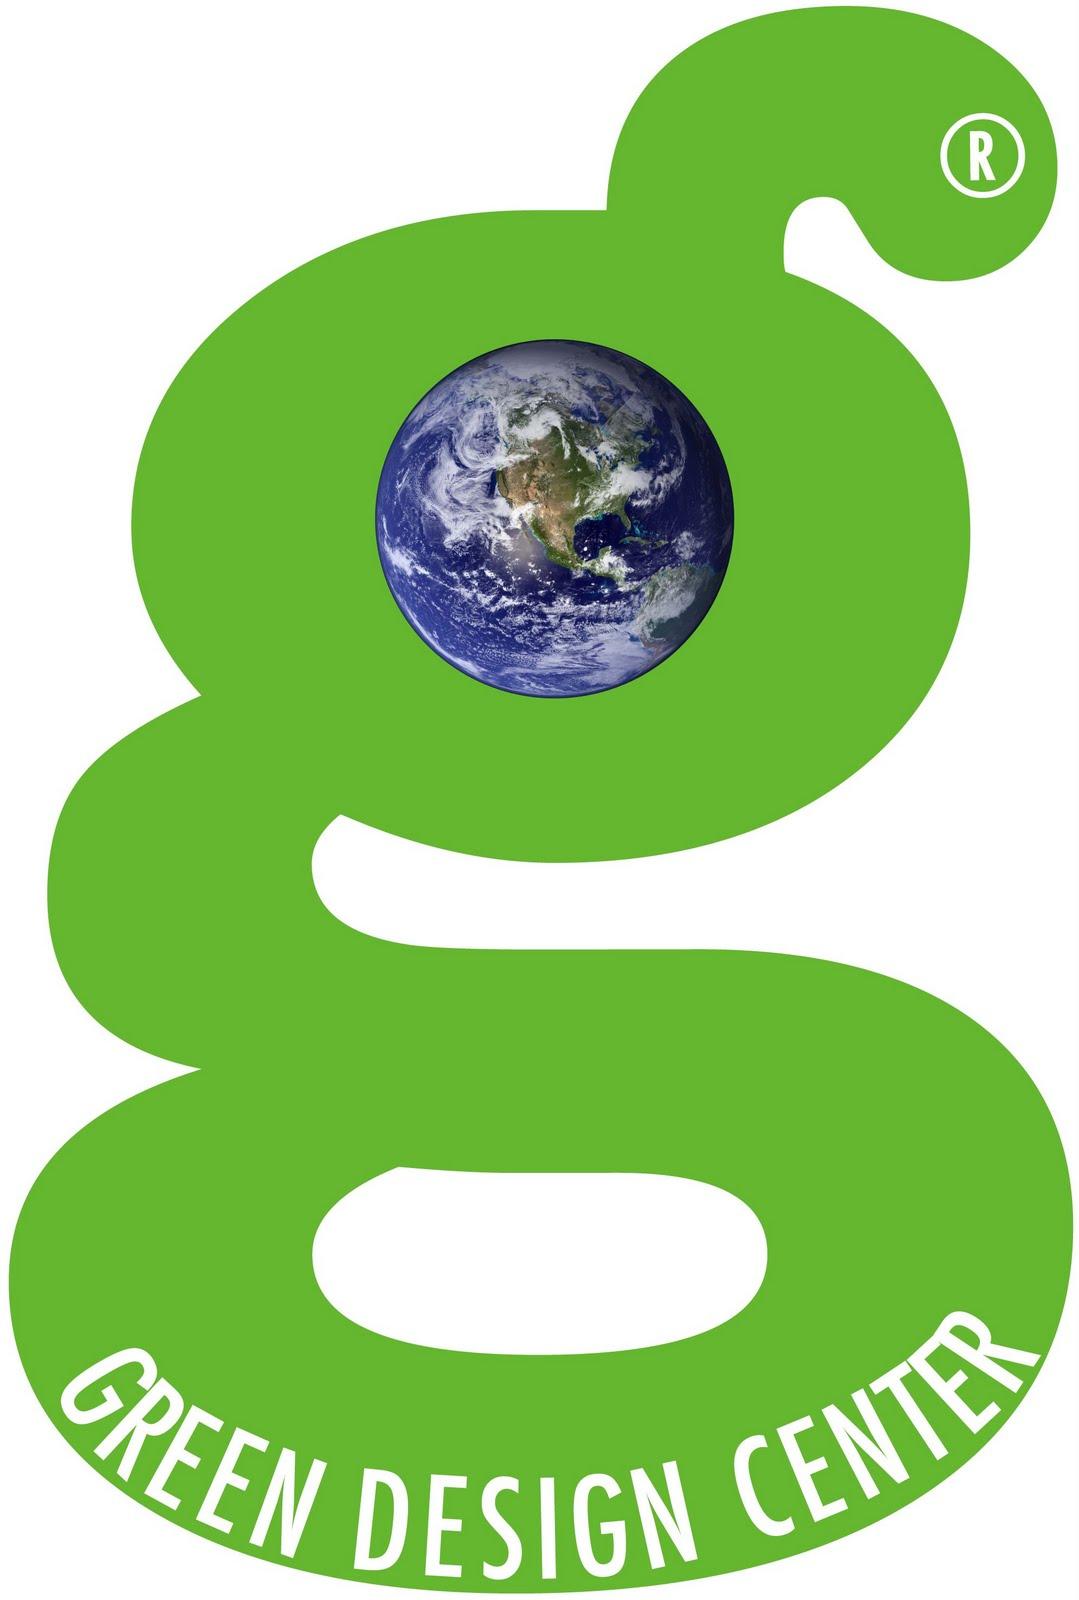 http://2.bp.blogspot.com/-CgHgYeiT0AY/TihkhhHHwSI/AAAAAAAAAro/OHIVoZjWMfA/s1600/THE+2011G%25C2%25AE+Logo+smaller.jpg